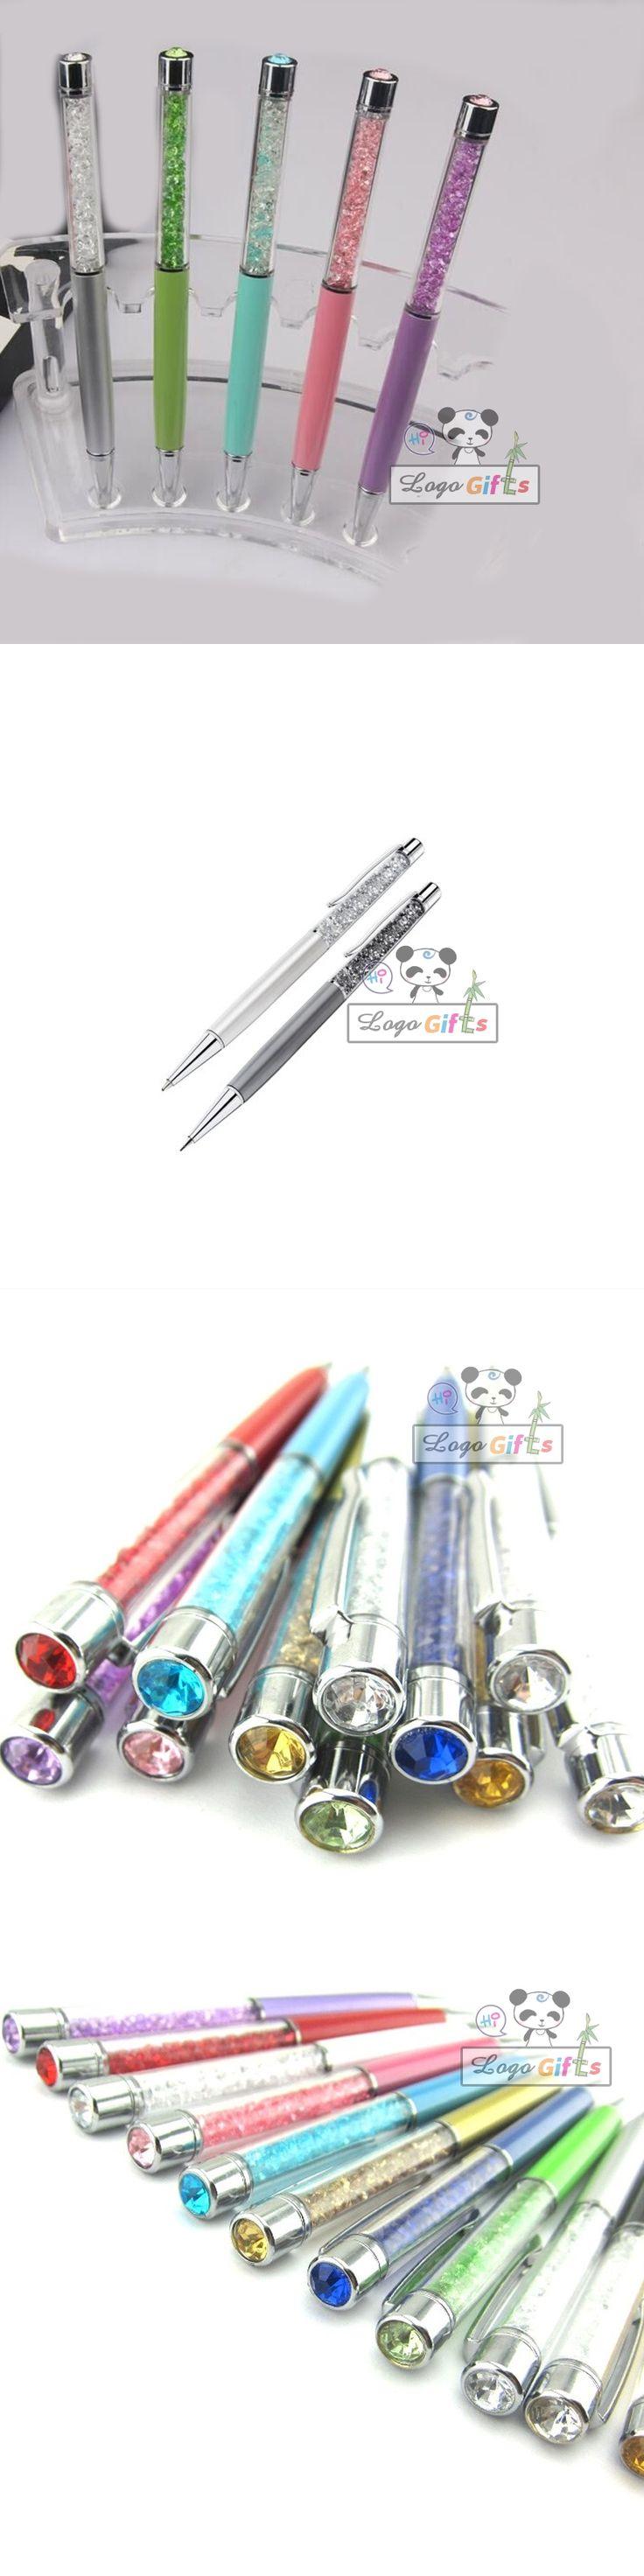 55 best Pens, Pencils & Writing Supplies images on Pinterest